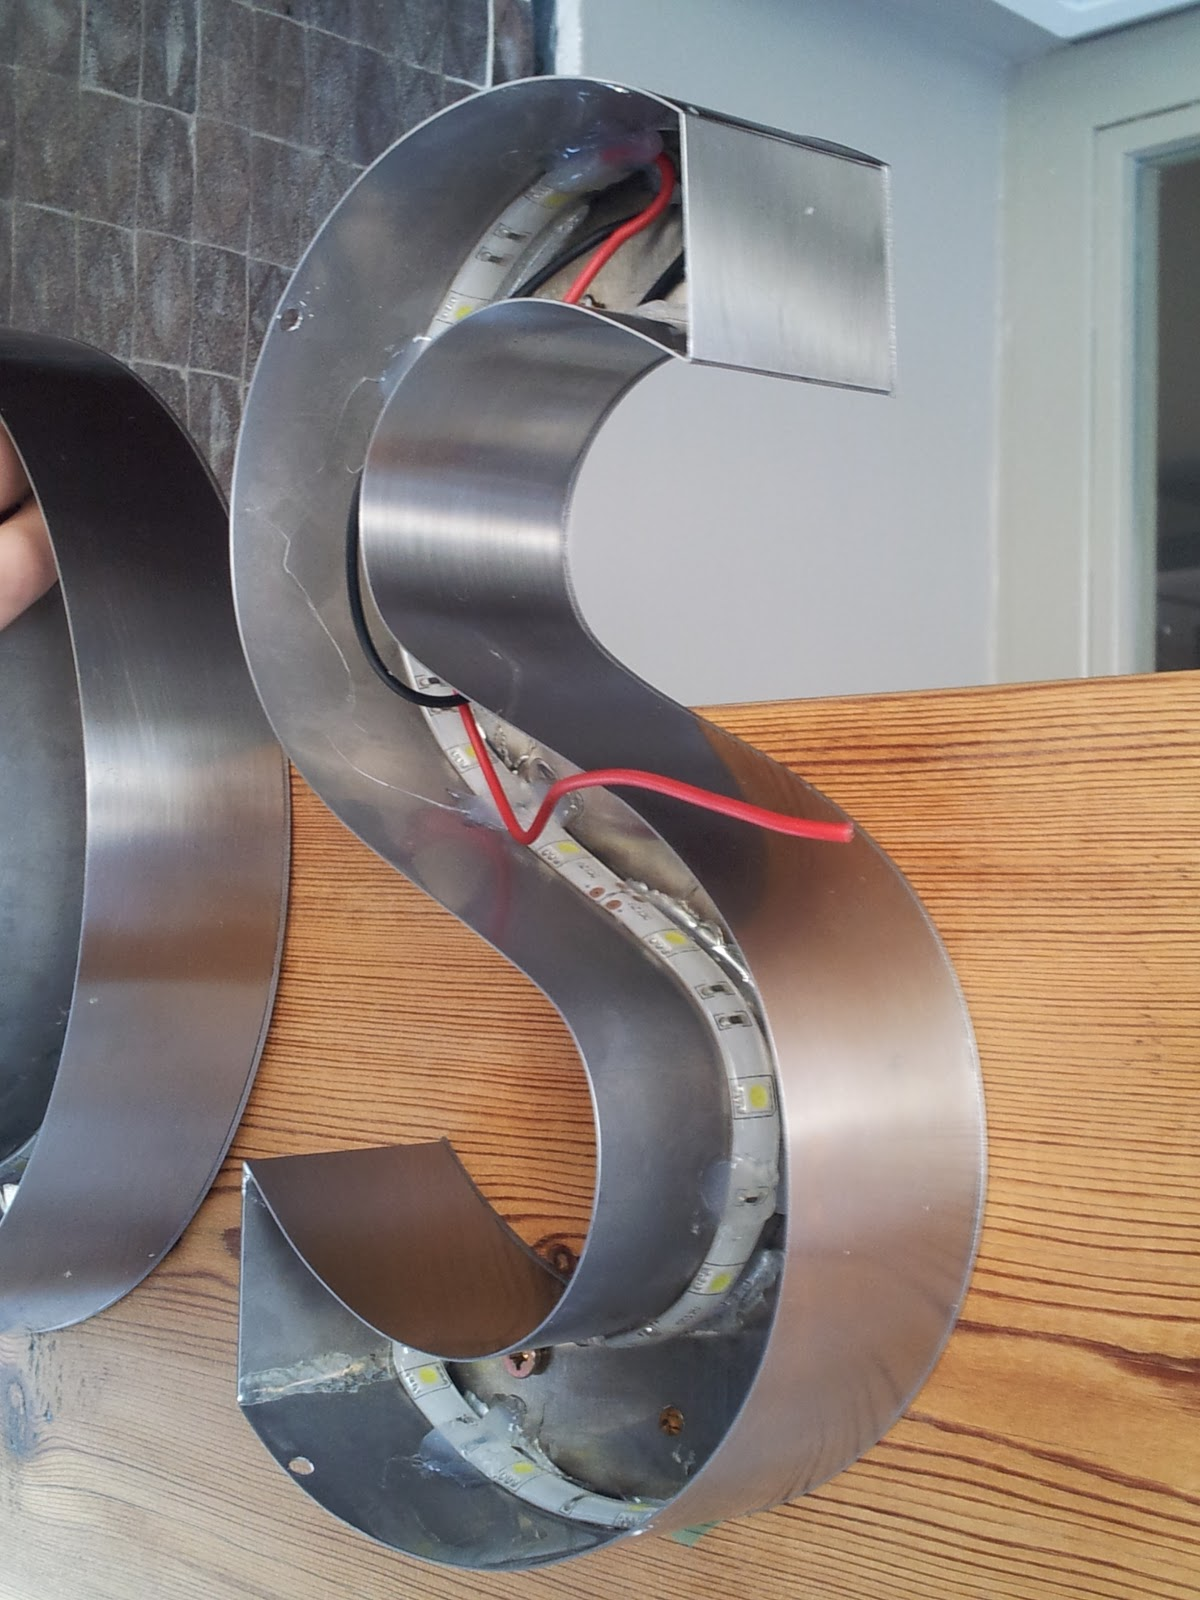 Letras corp reas letras de leds 96150 63 00 letras acero - Fabricacion letras corporeas ...